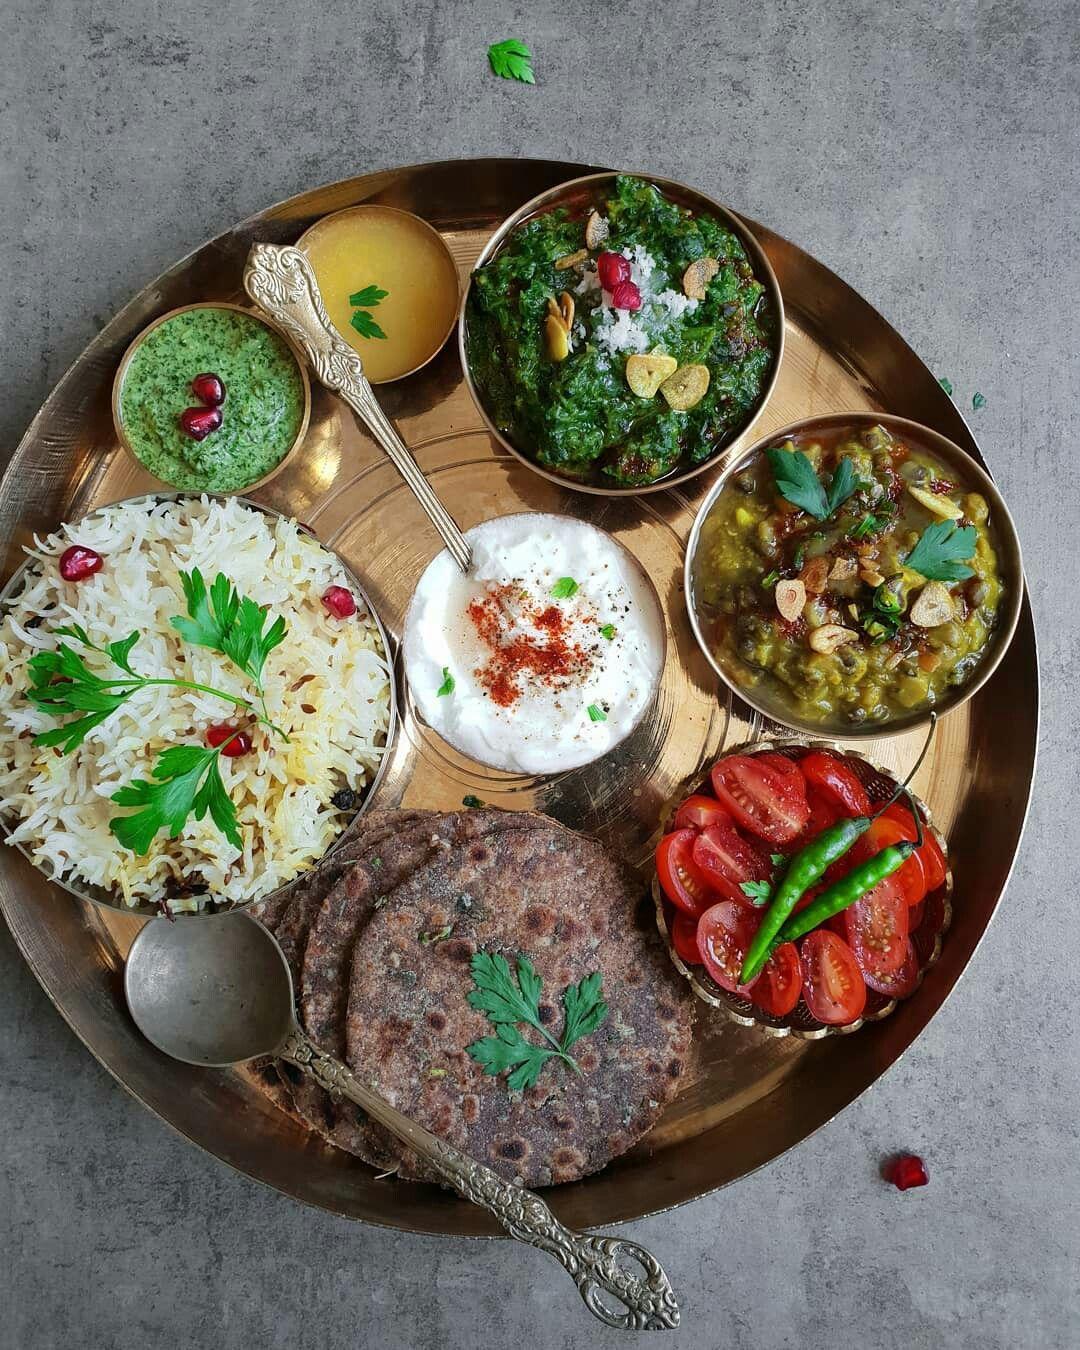 Pin by SEELESH on FOOD ODISHA Indian food photography